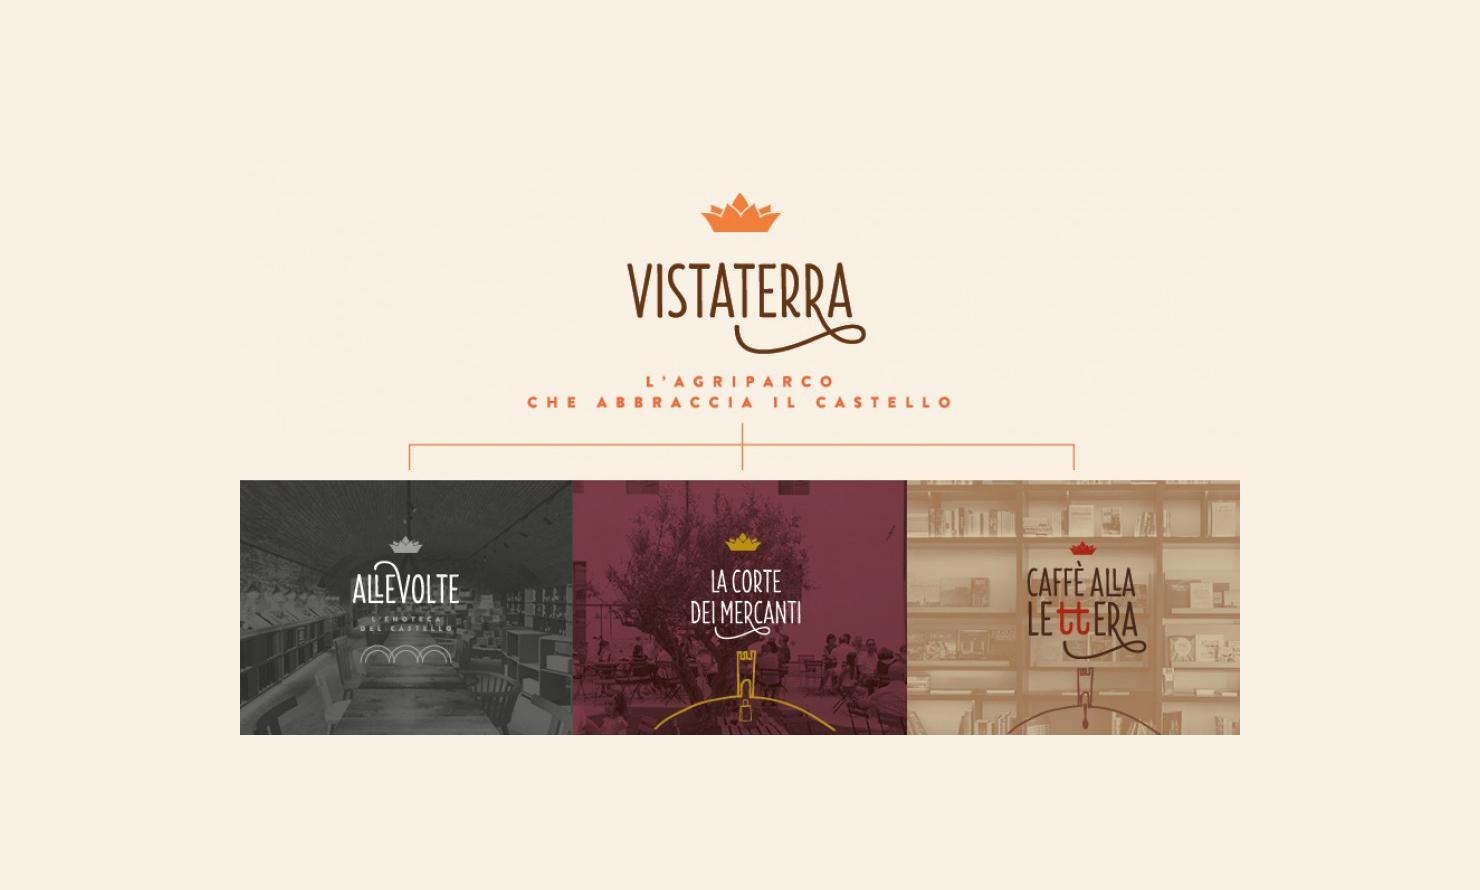 https://kubelibre.com/uploads/Slider-work-tutti-clienti/manital-vistaterra-l-agriparco-che-abbraccia-il-castello-brand-identity-brand-strategy-1.jpg